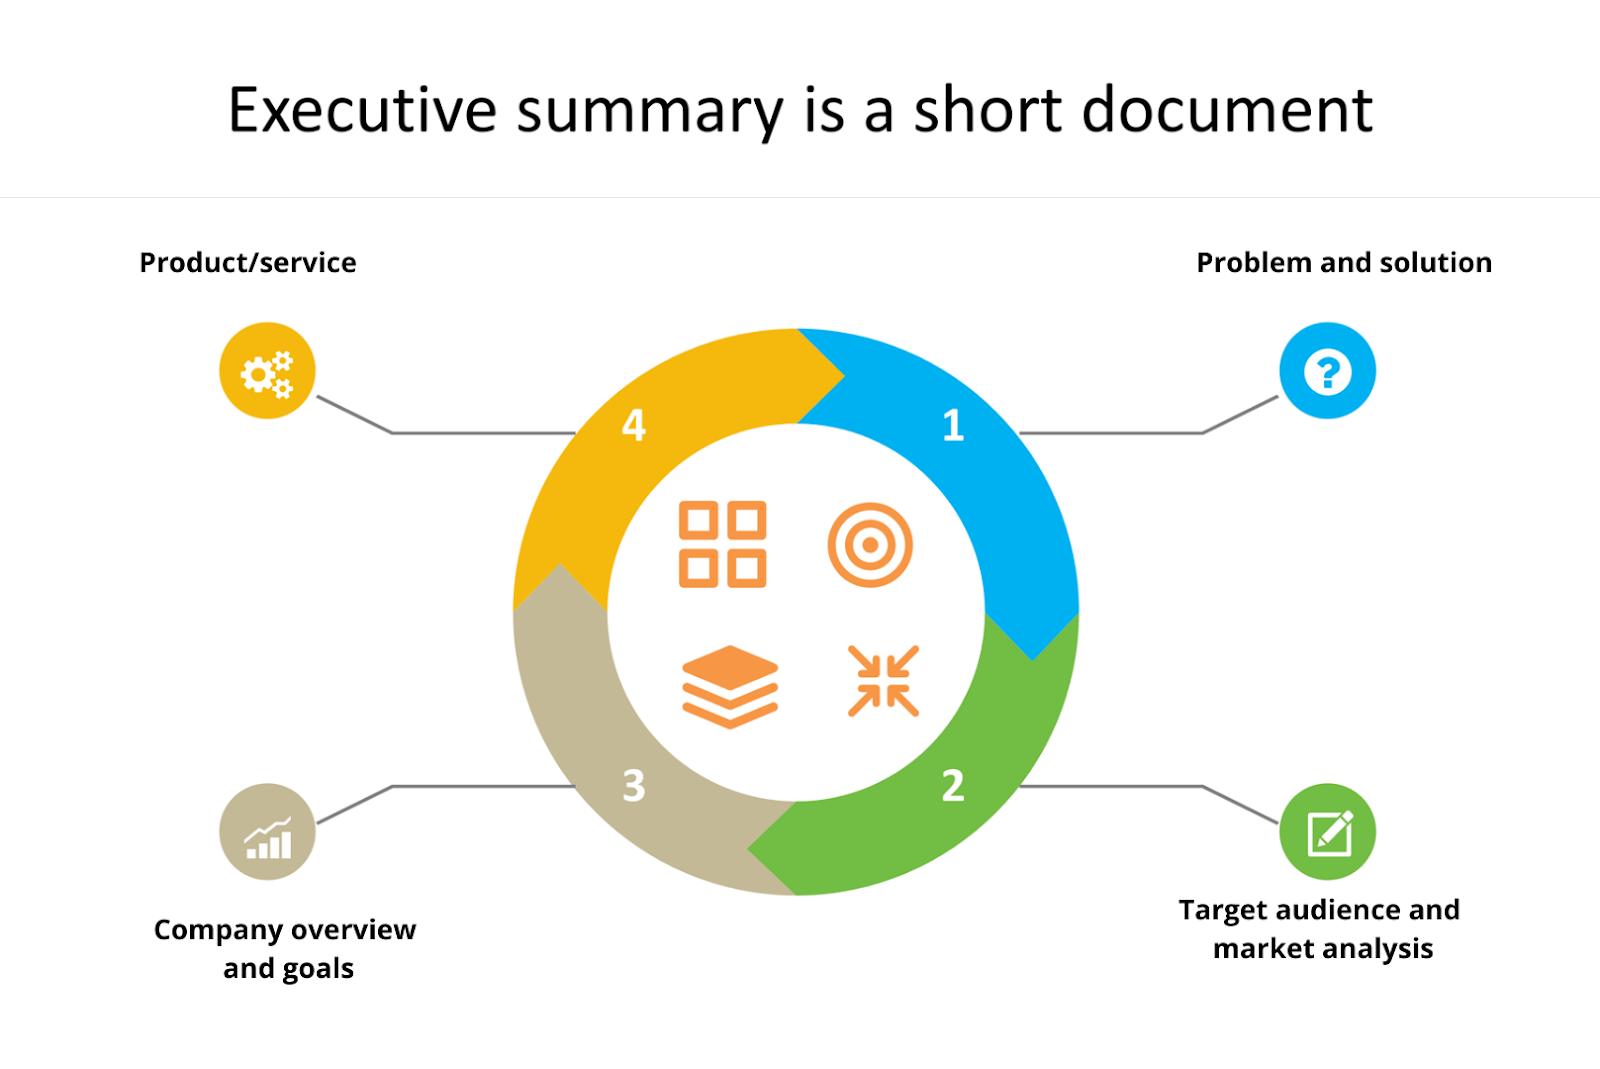 executive summary is a short document